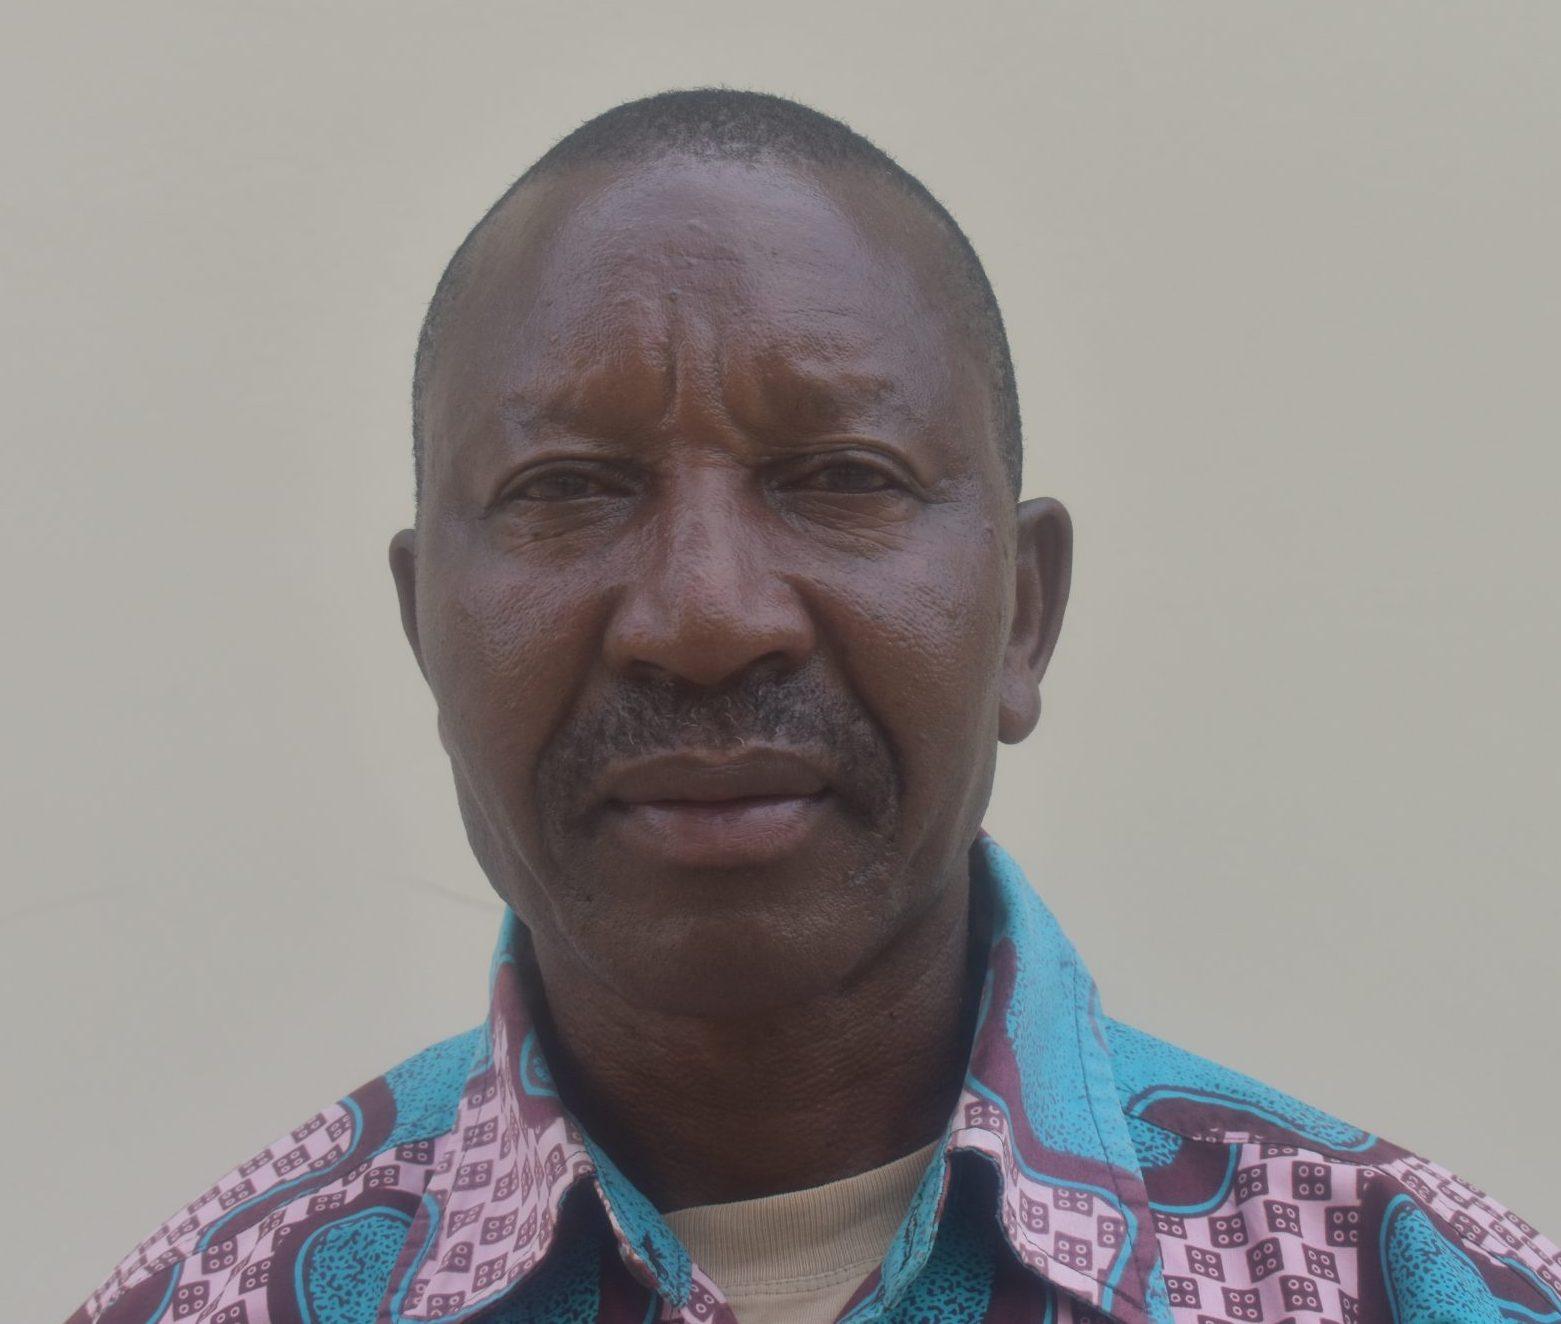 Bw. Lameck Nyasagati